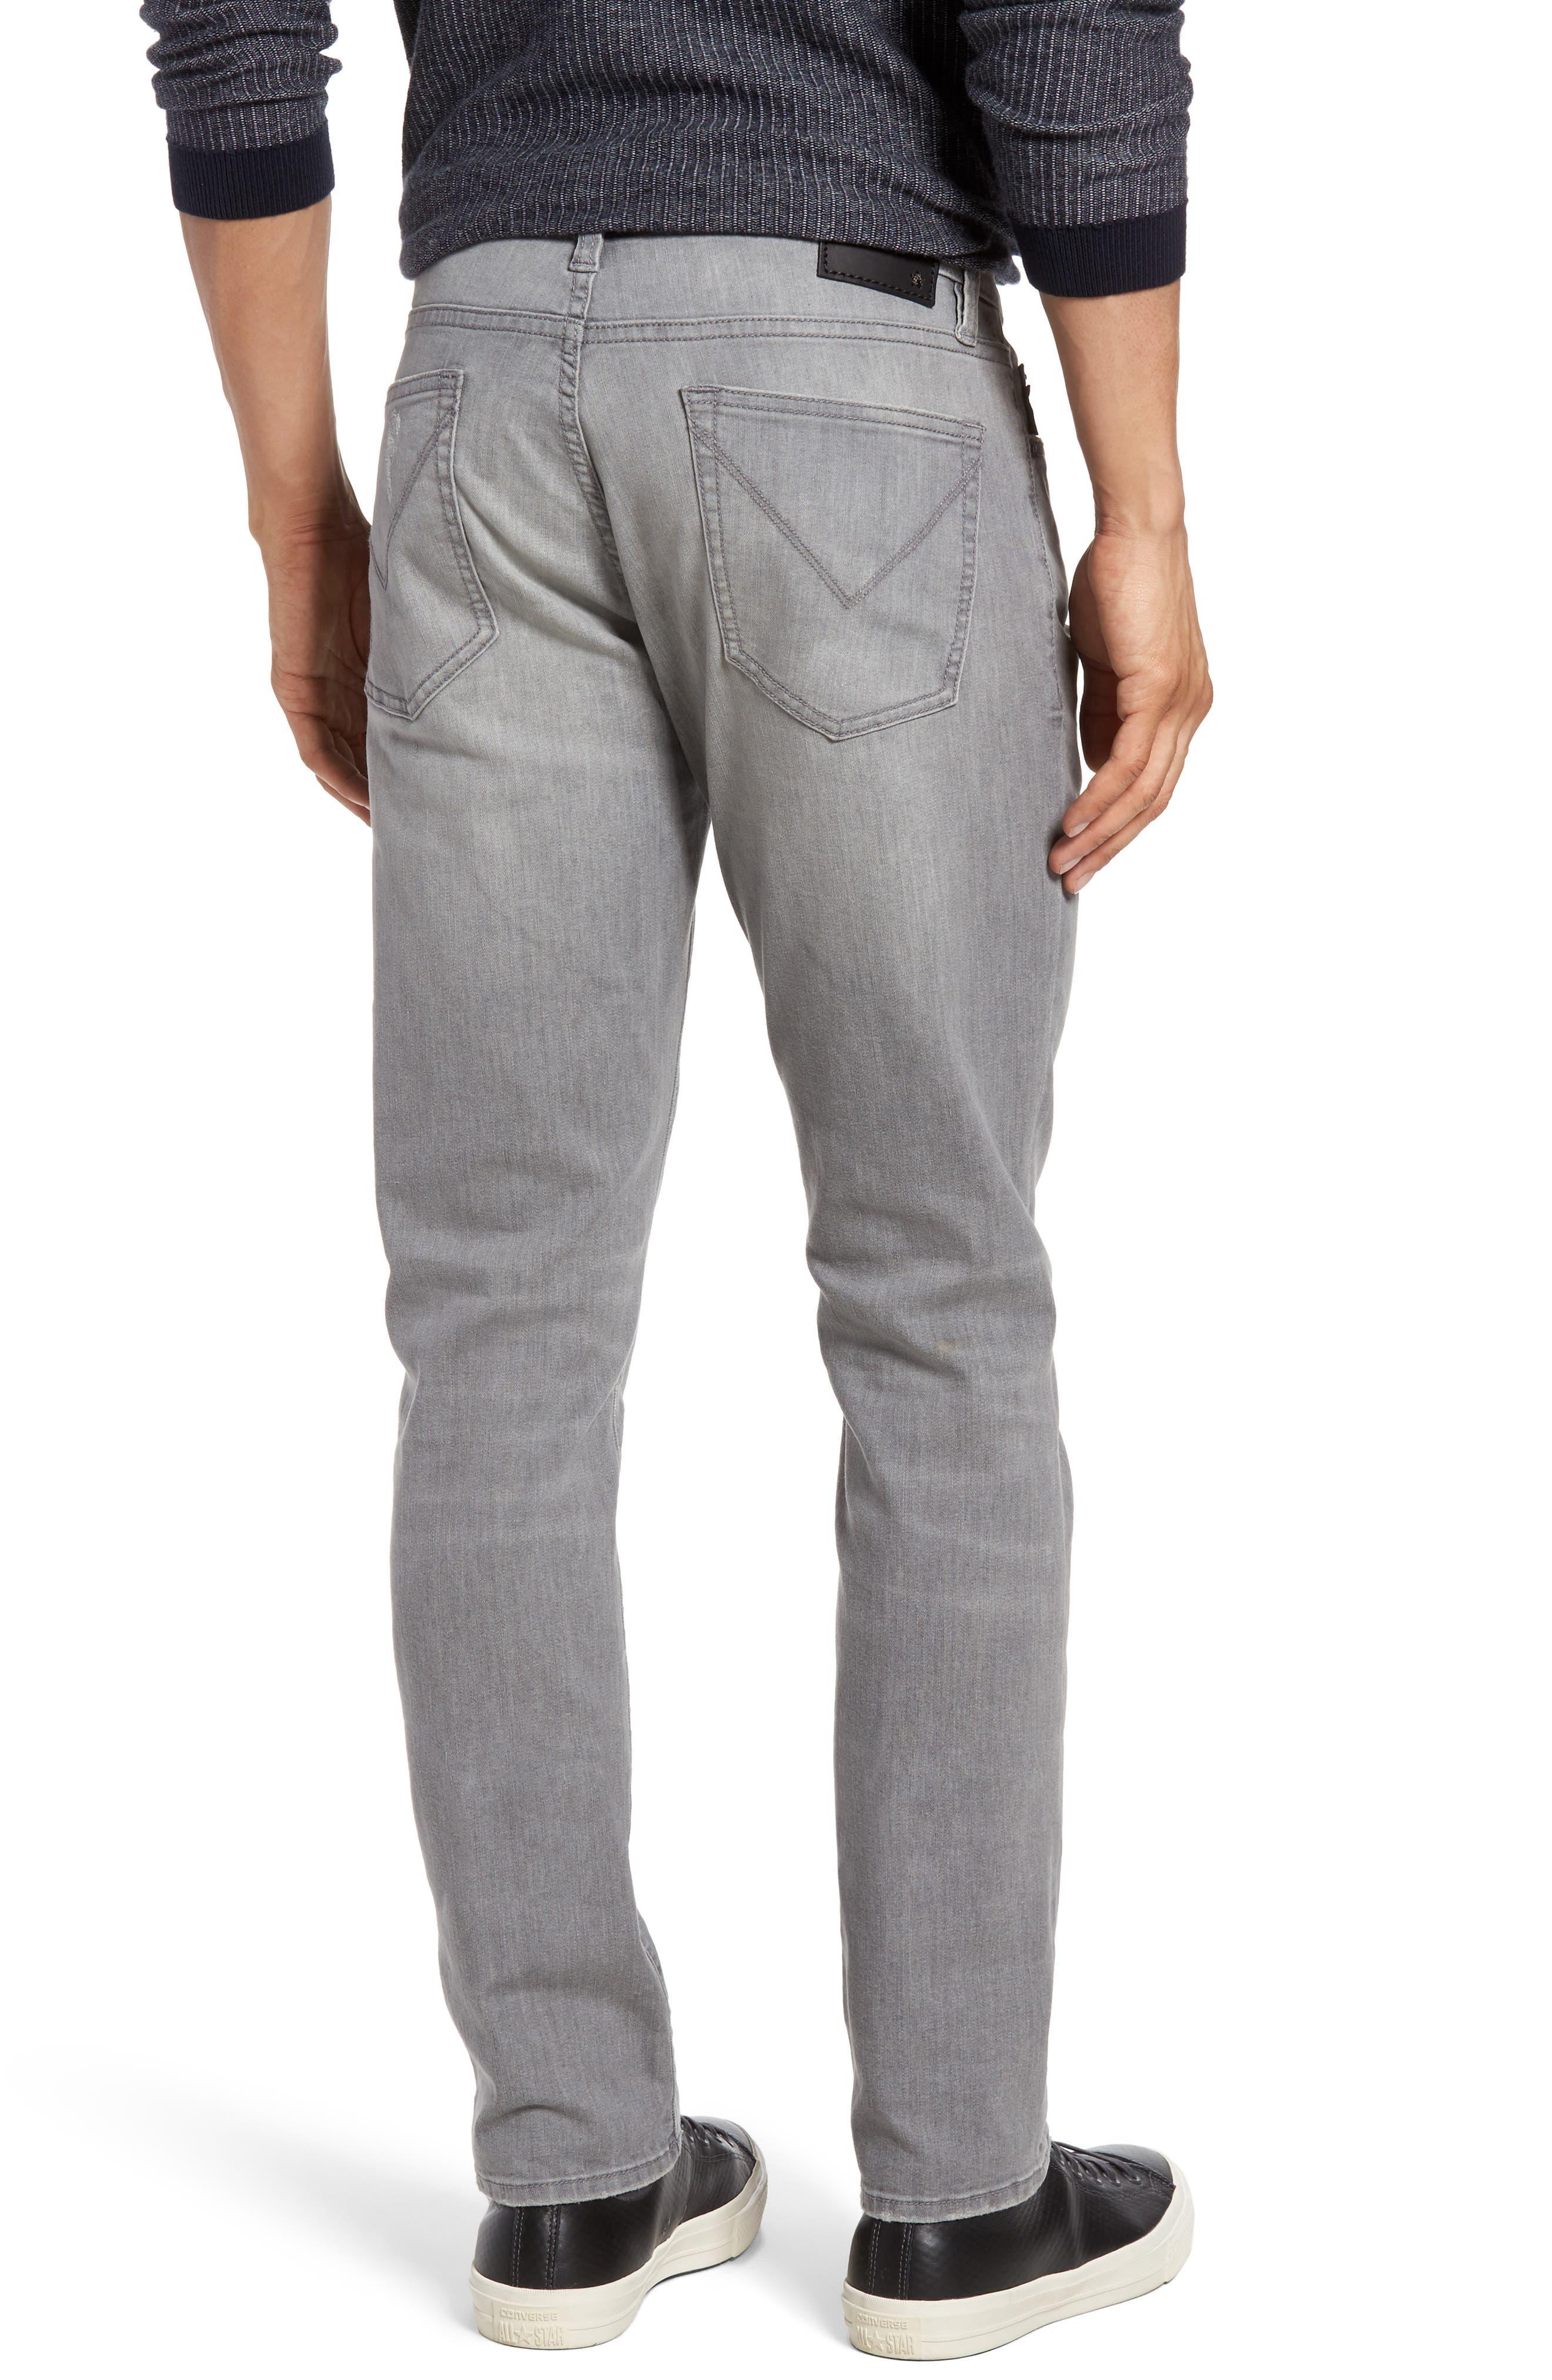 Wight Skinny Jeans,                             Alternate thumbnail 2, color,                             Medium Grey